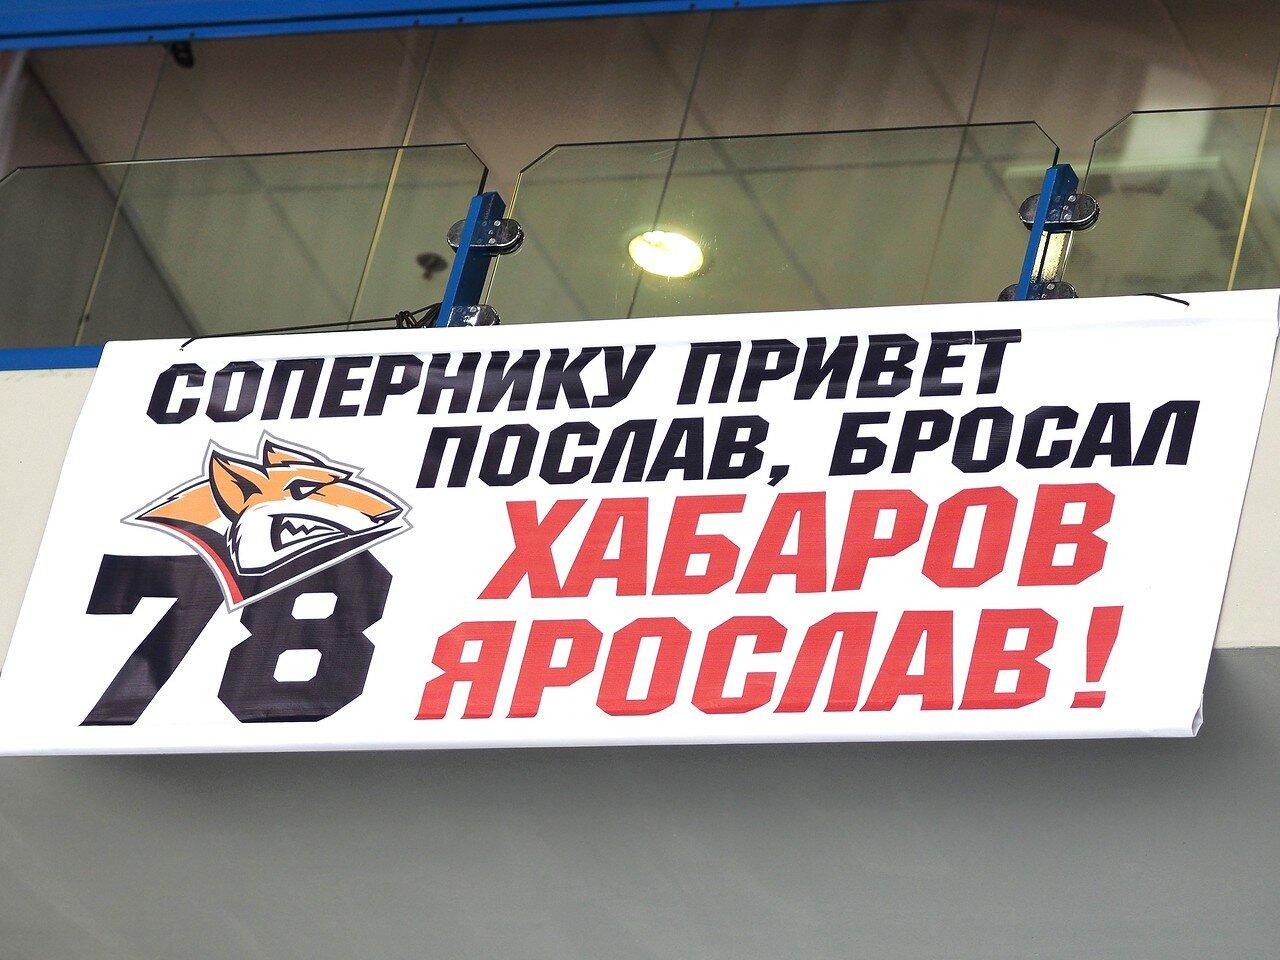 165Восток 1/2 плей-офф Металлург - Сибирь 08.03.2016